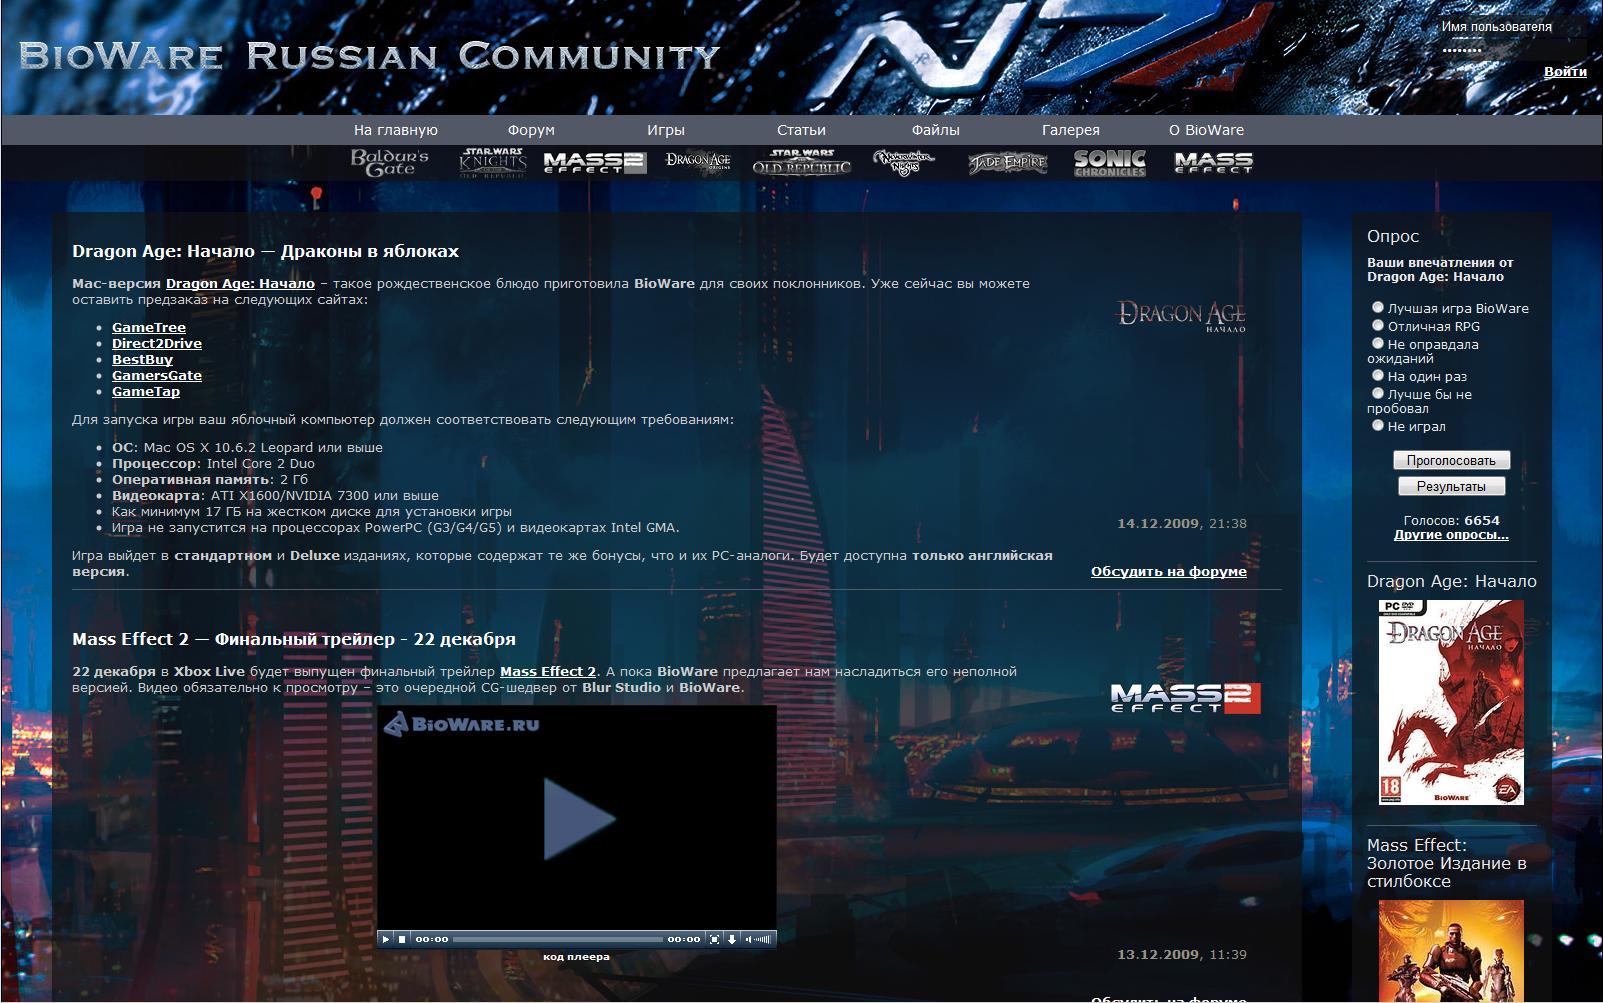 BioWare Russian Community